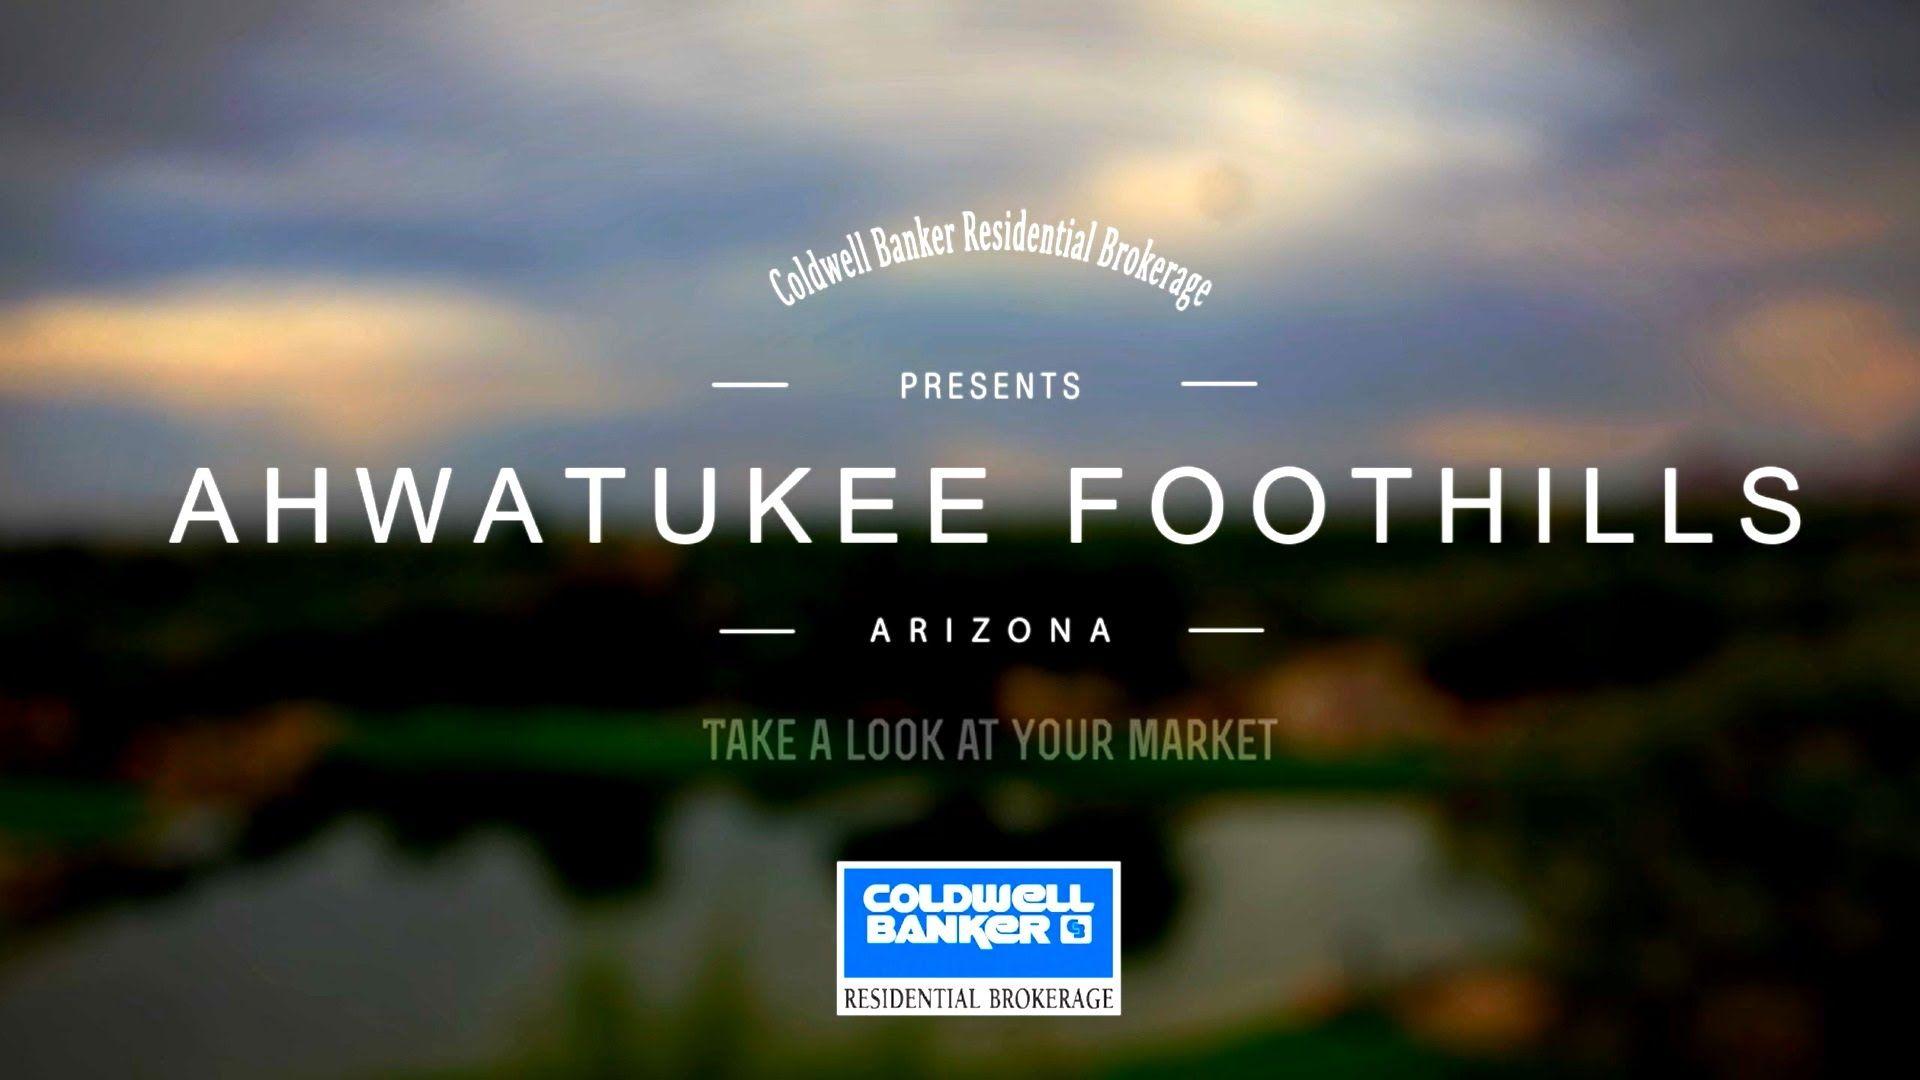 Ahwatukee Foothills Arizona Real Estate Market August 2016 ...